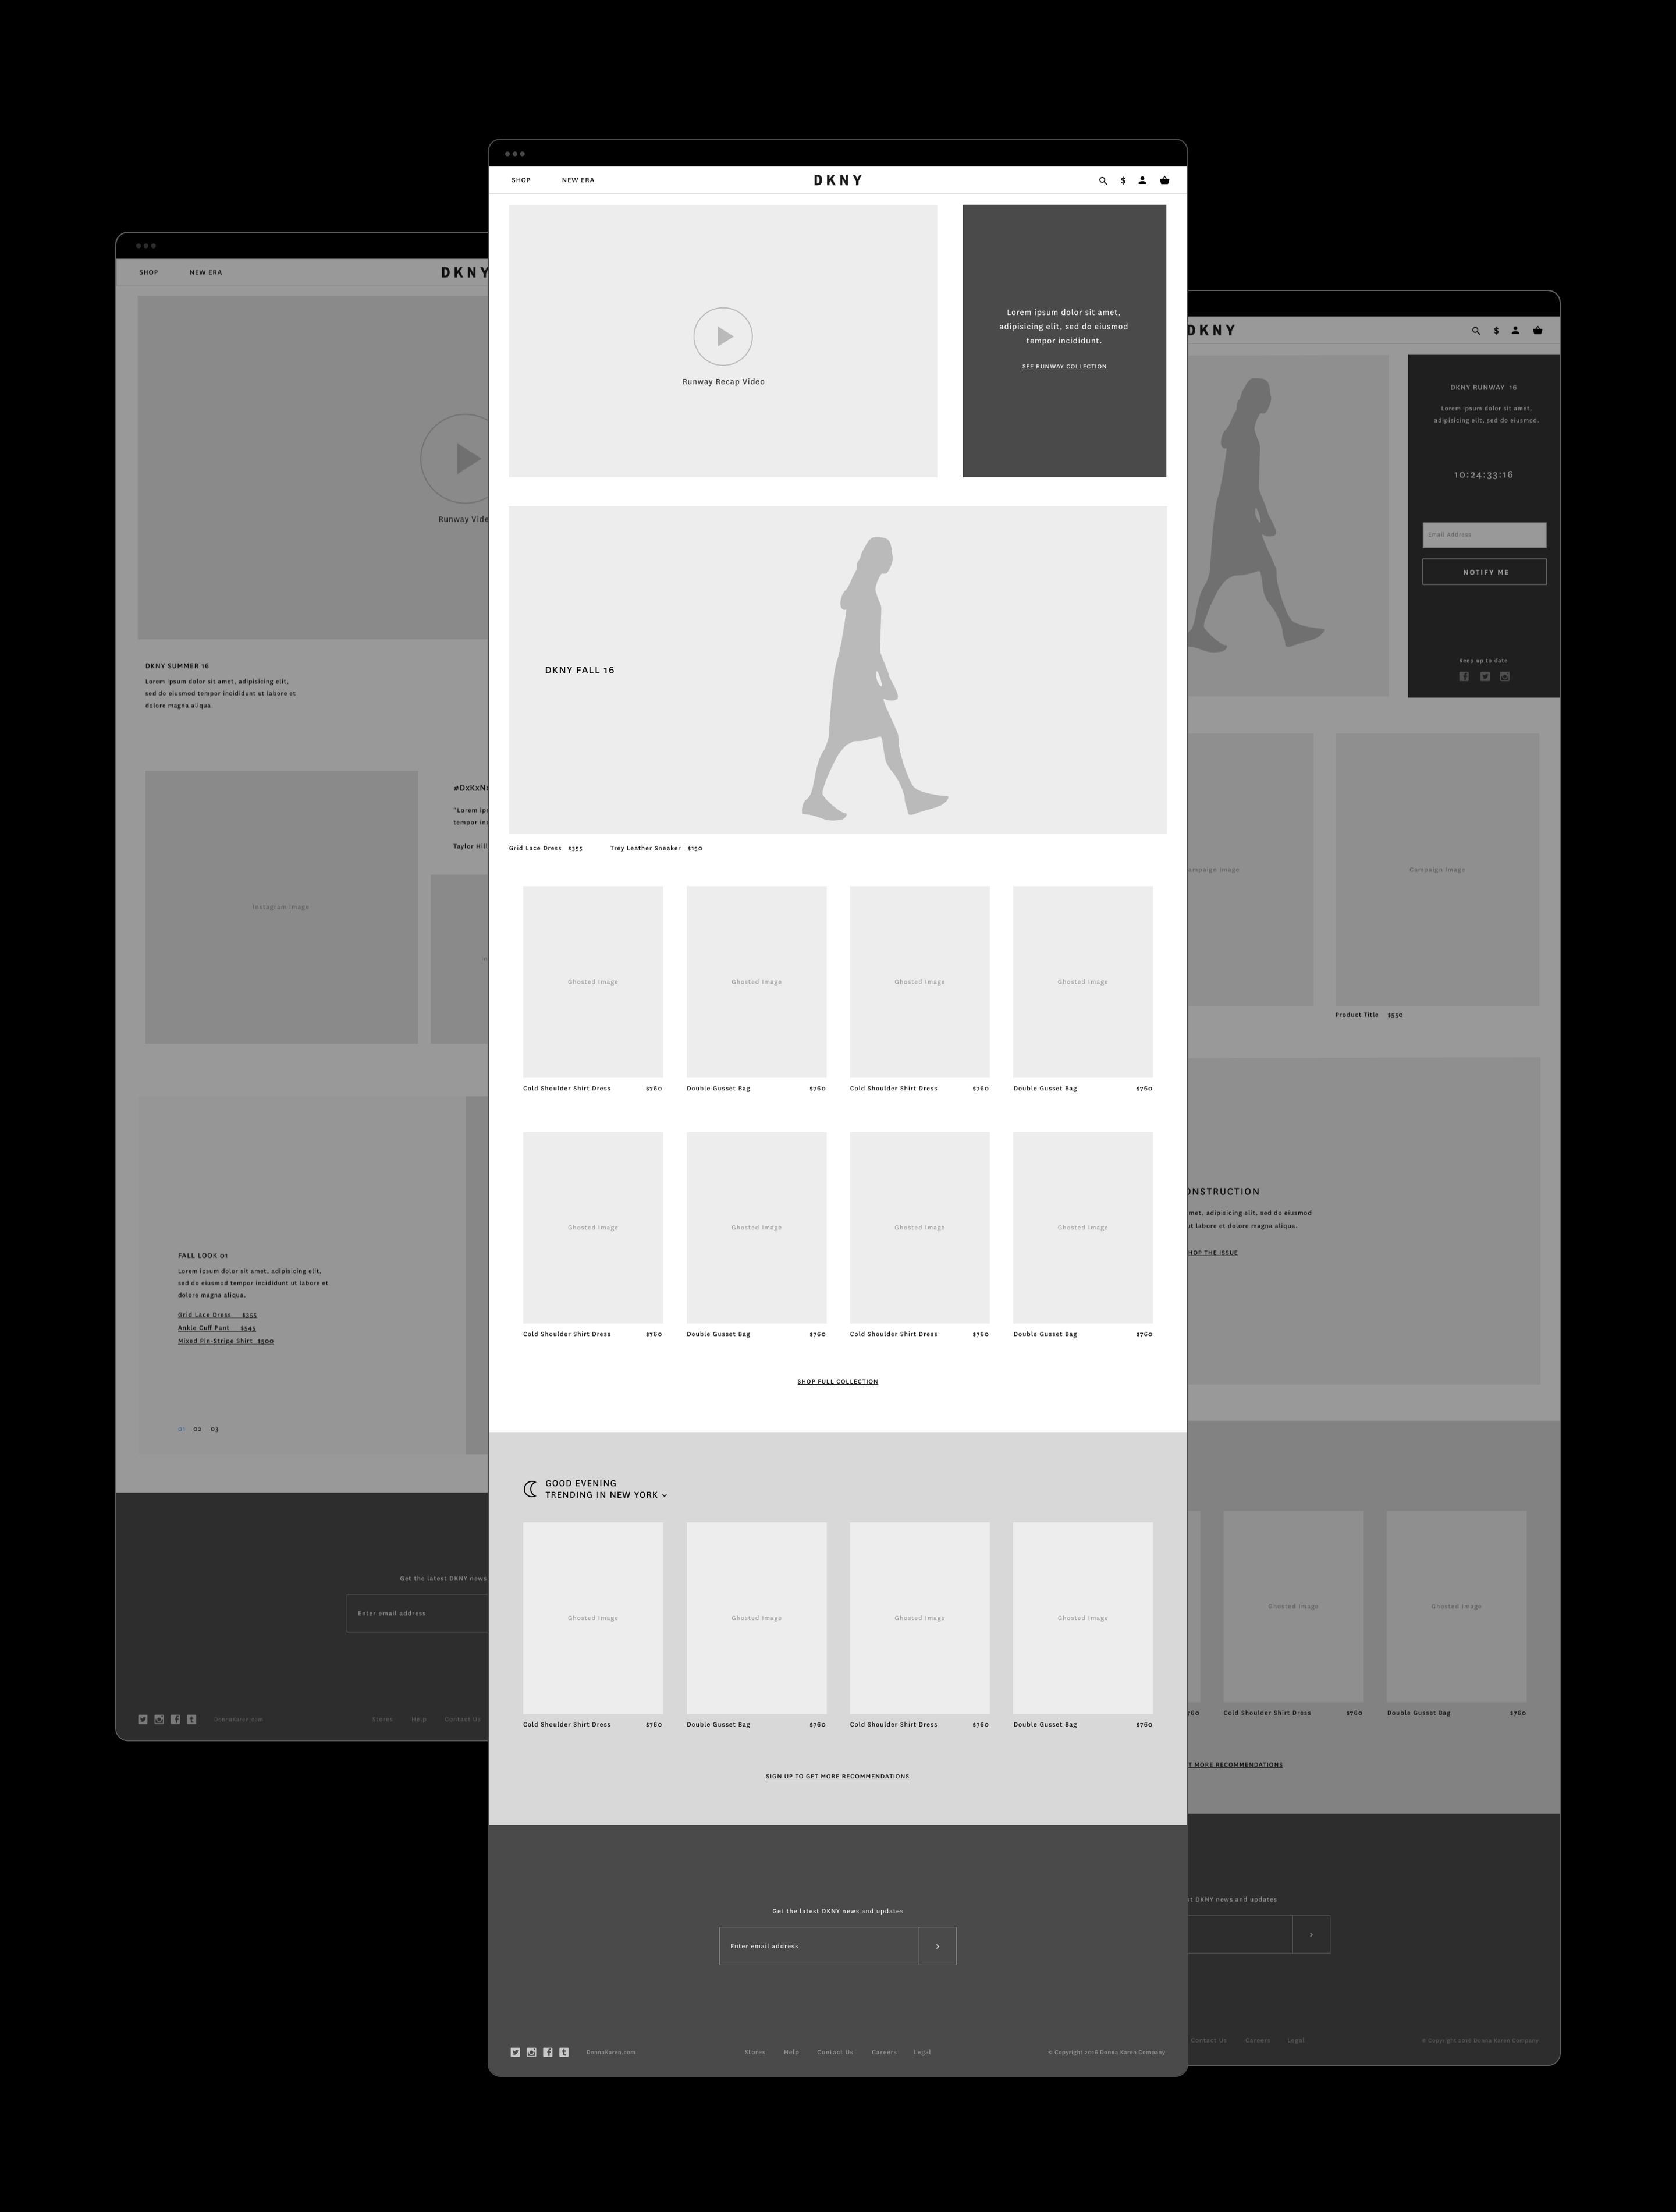 dkny_homepage